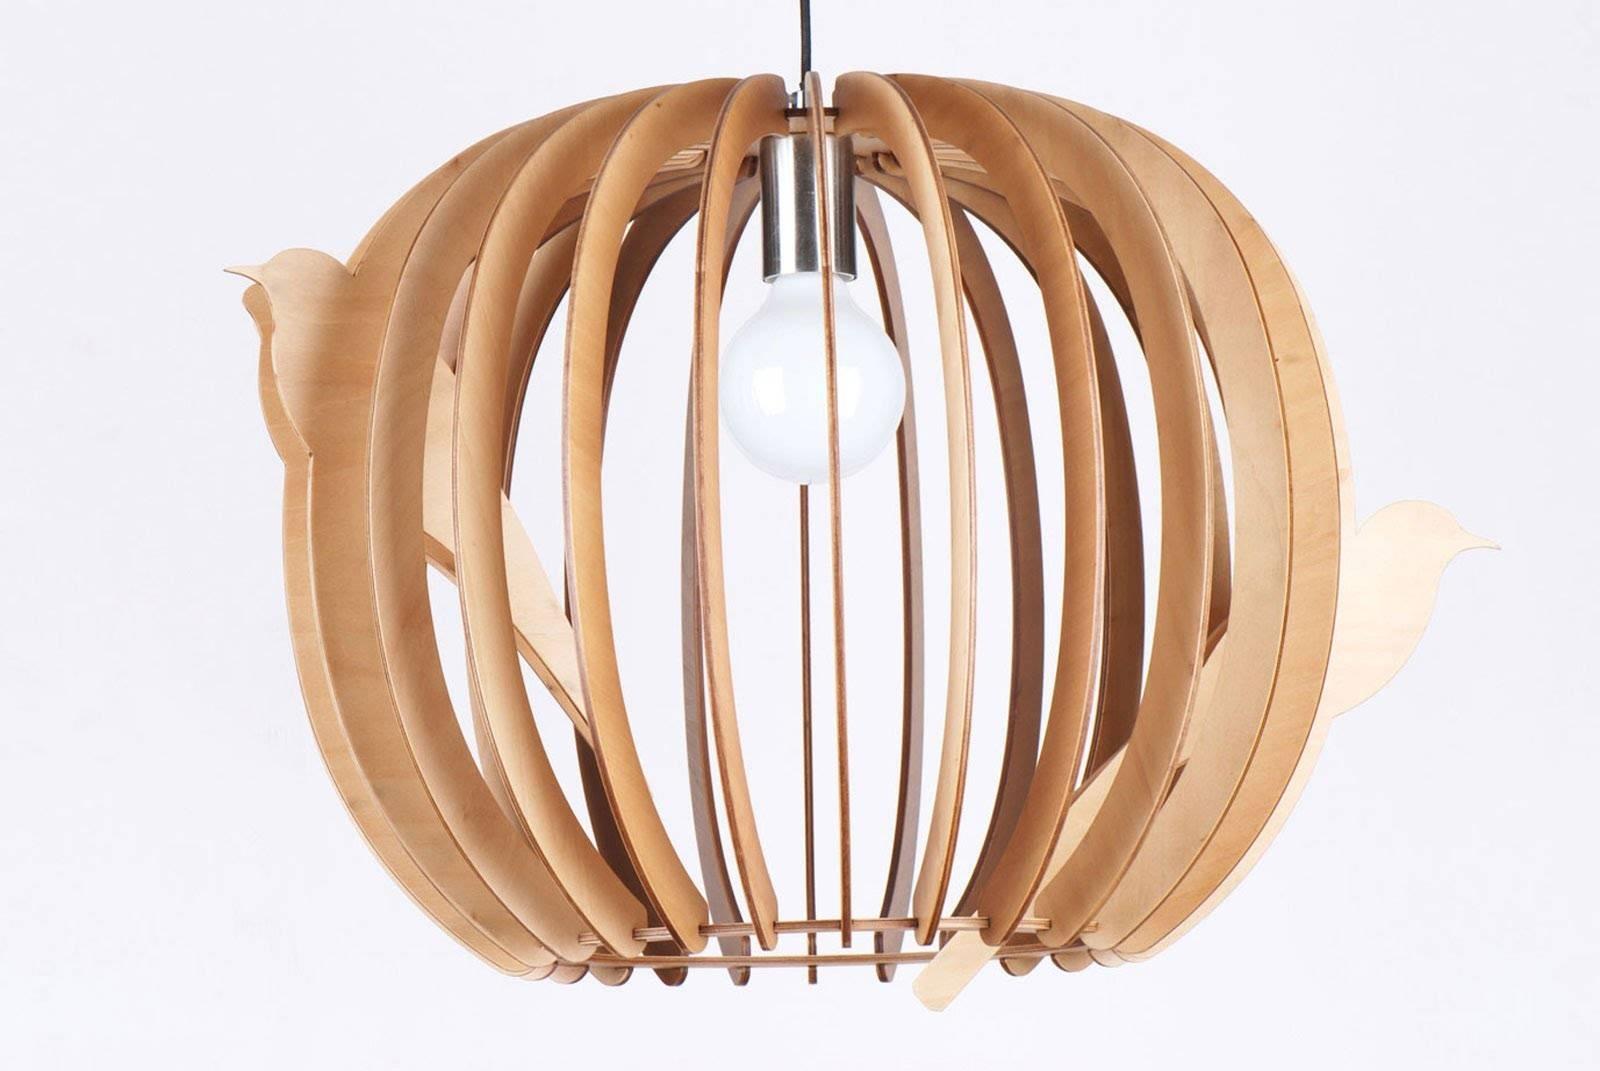 Buy Wood Pendant Light In Melbourne [Birds Nest] - Youtube in Bentwood Pendants (Image 4 of 15)